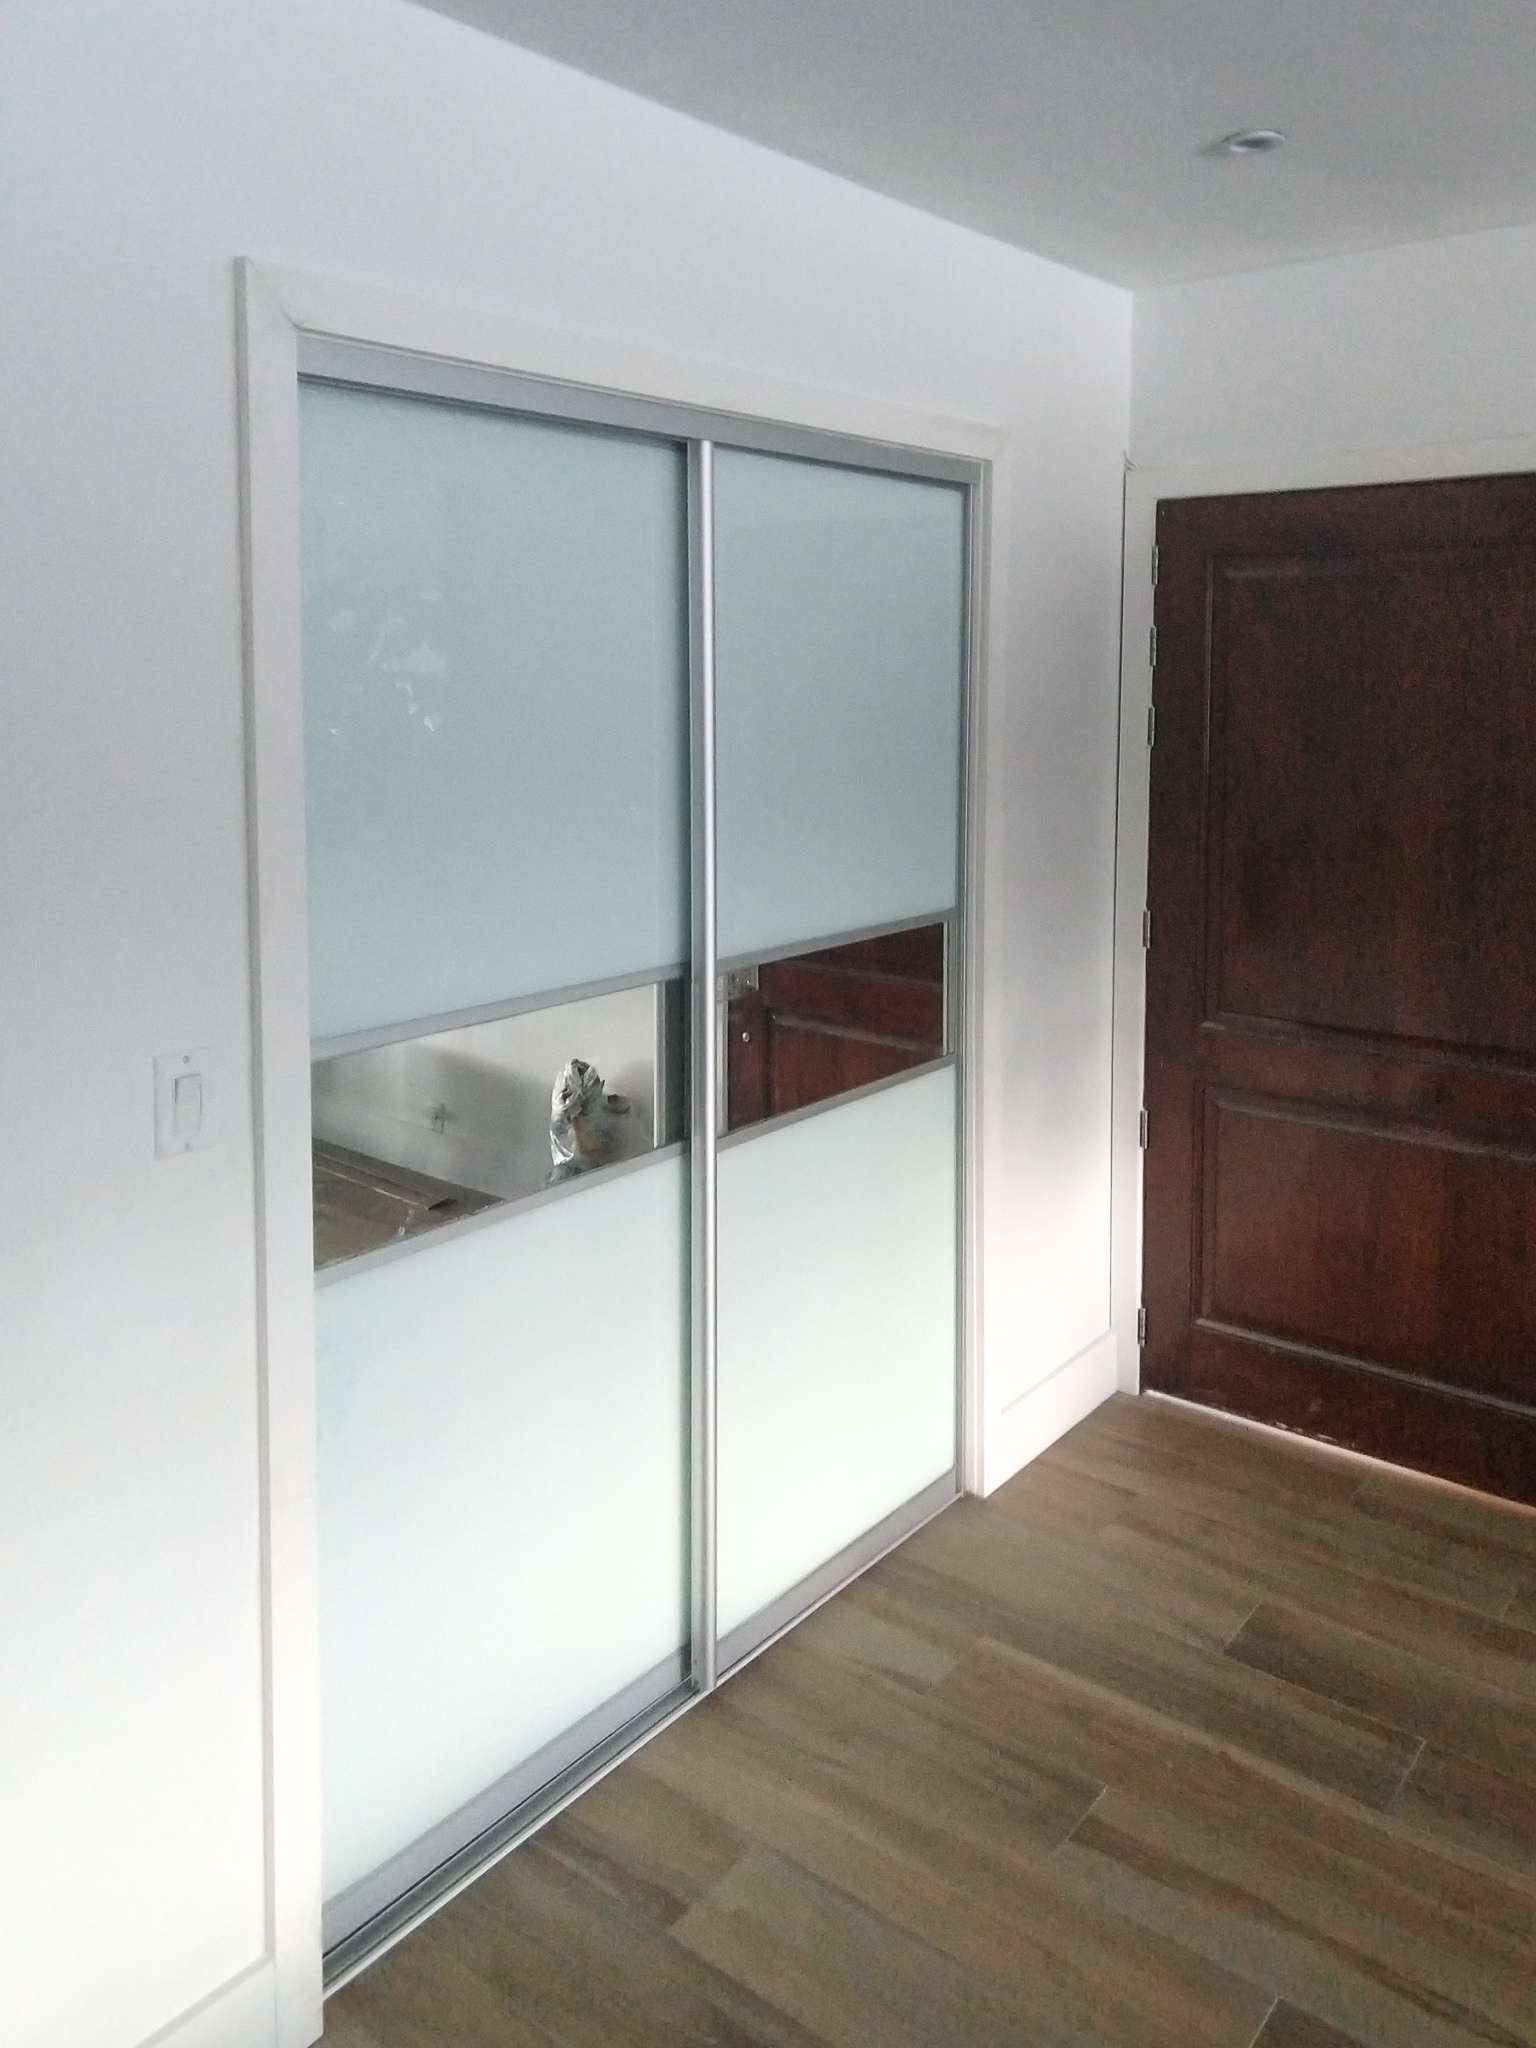 Extra Wide Sliding Closet Doors Miami Beach